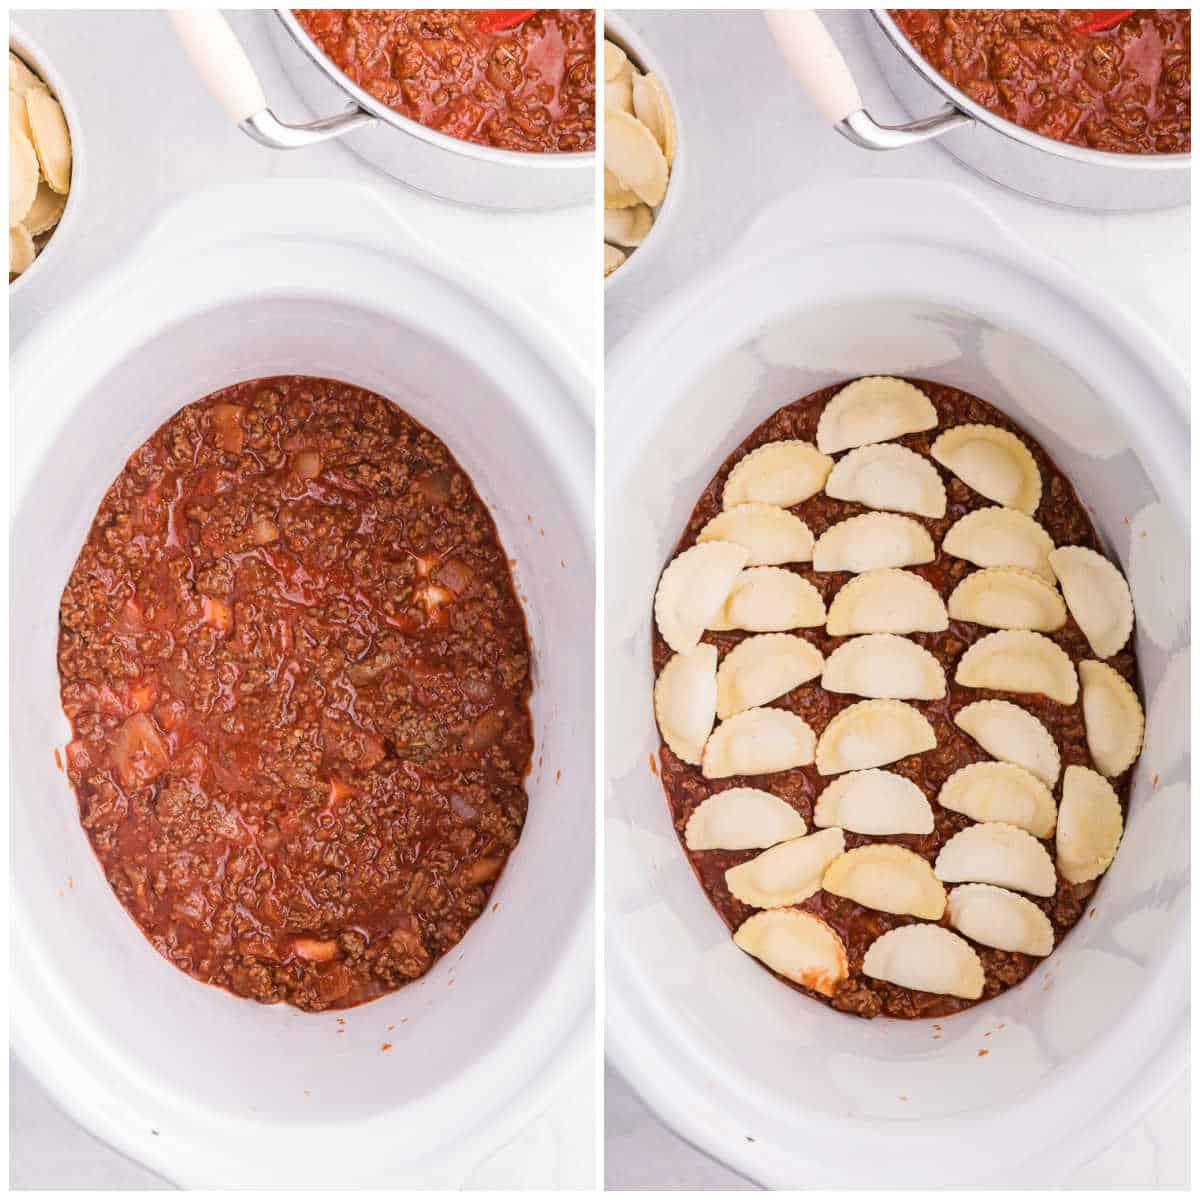 Steps to make slow cooker ravioli lasagna.